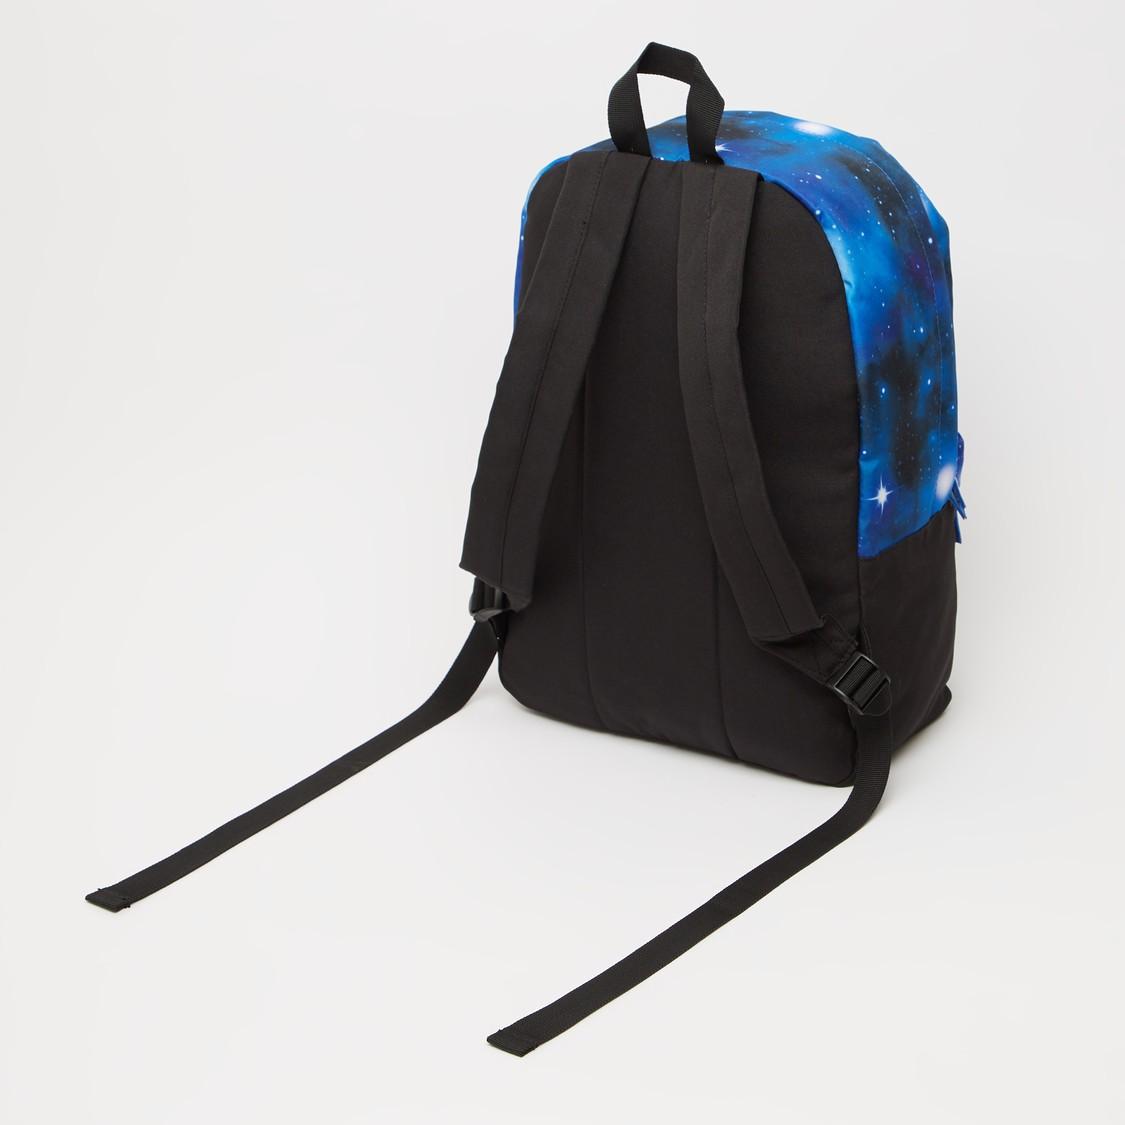 NASA Print Backpack with Adjustable Shoulder Straps - 16 Inches